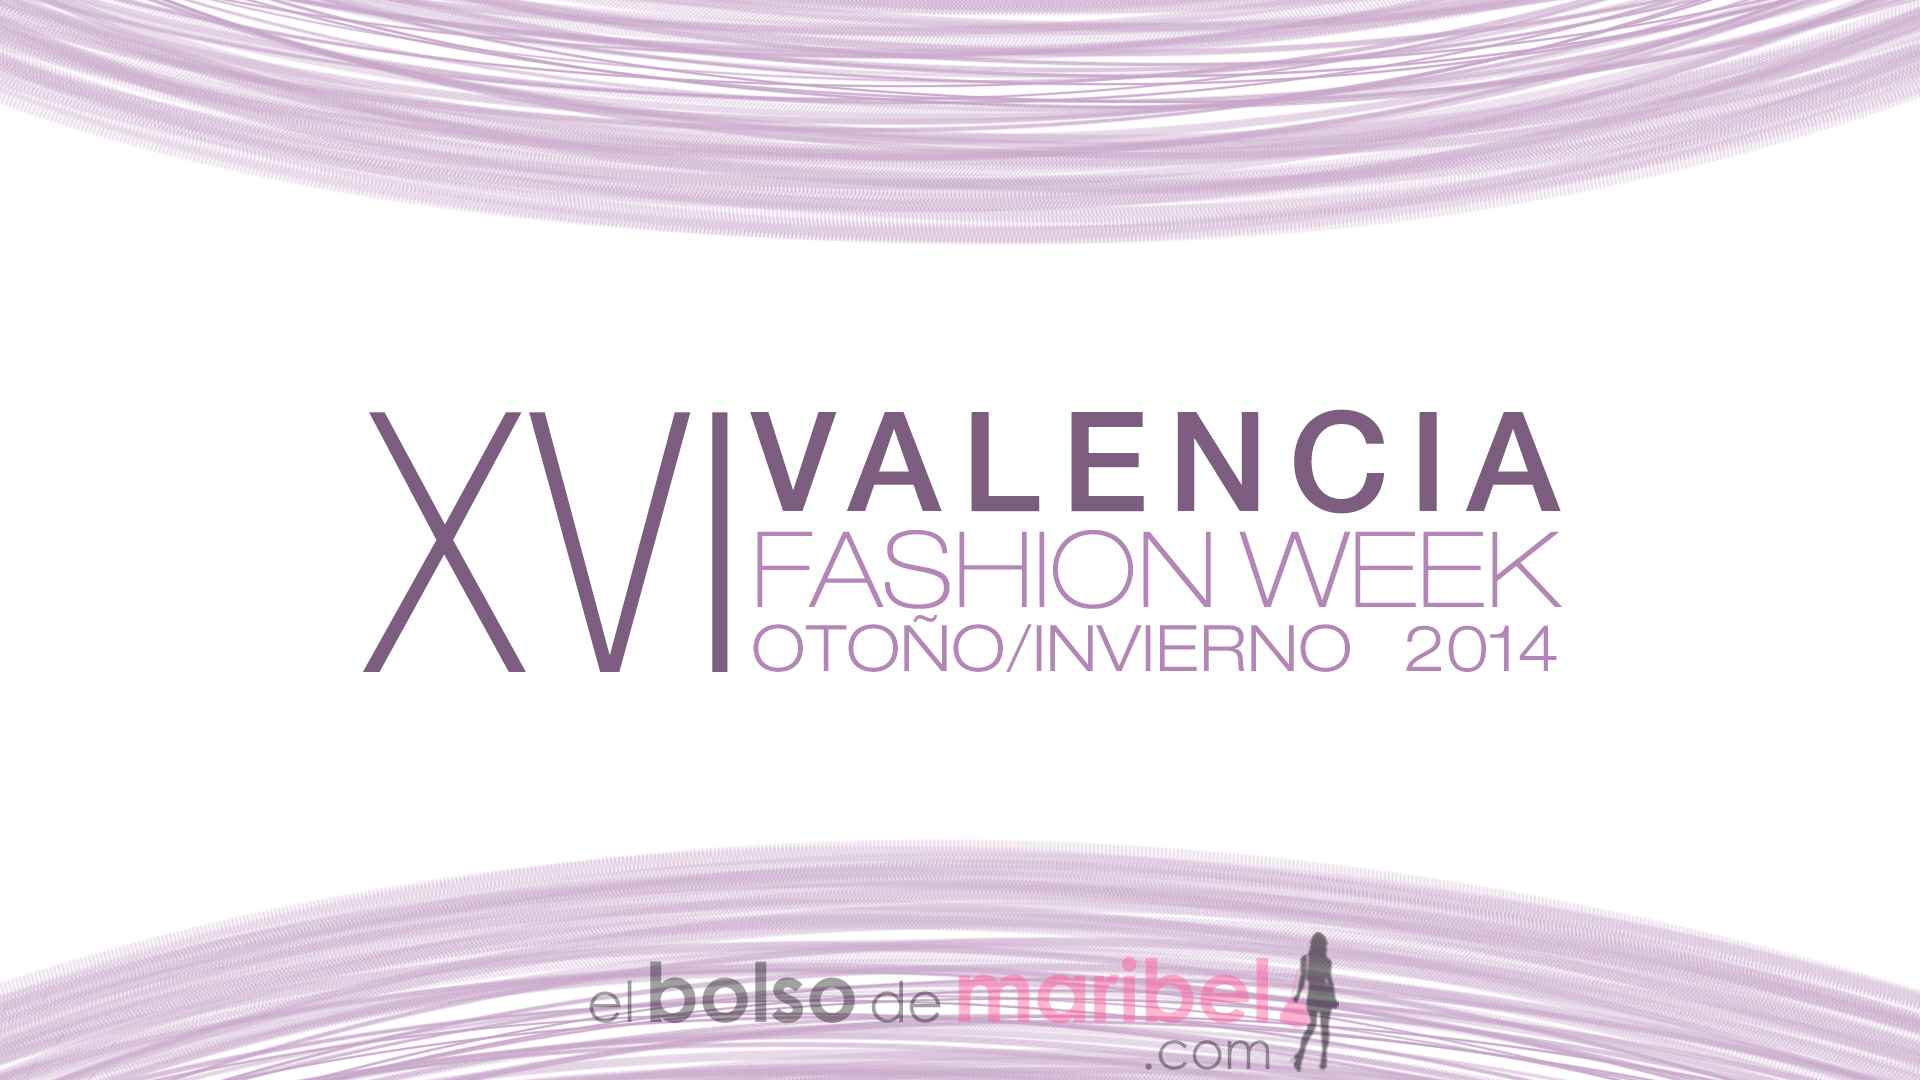 XVI Valencia Fashion Week 2014